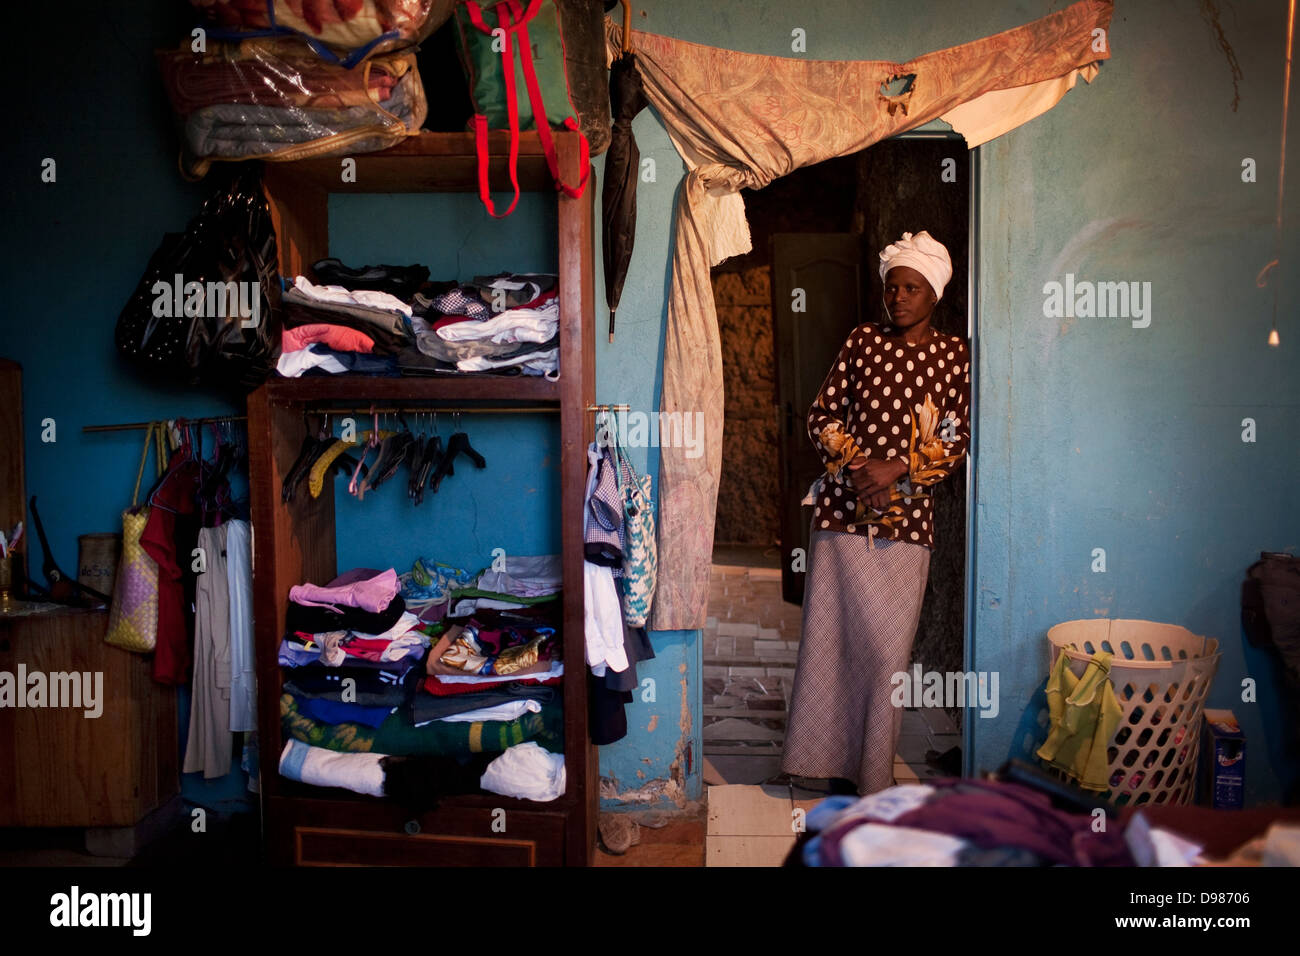 Amanda Nkosi 35-year-old single mother two stands in doorway children's bedroom She has been living in Mataffin - Stock Image